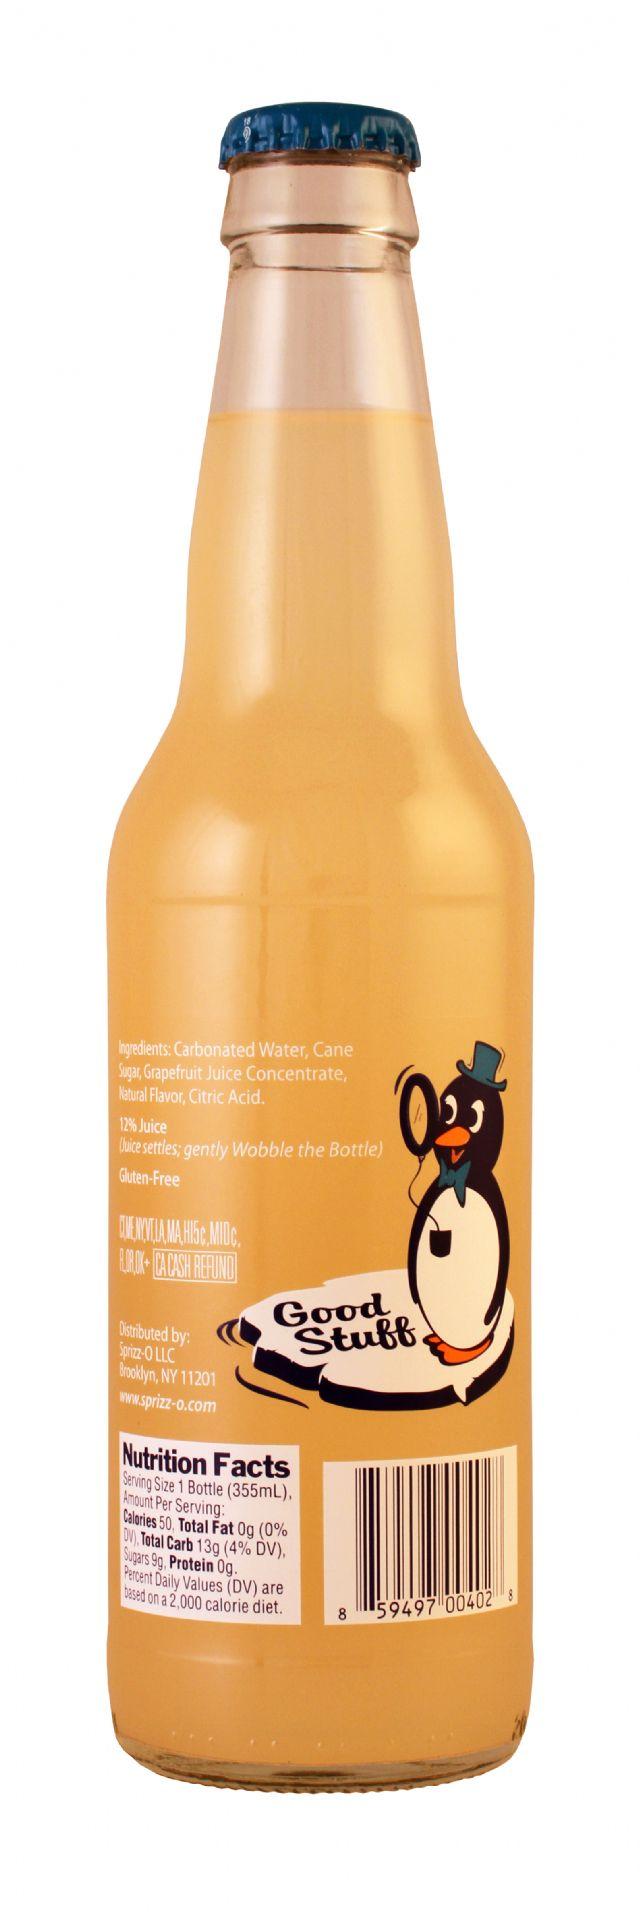 Sprizz-O: Sprizzo Grapefruit Facts